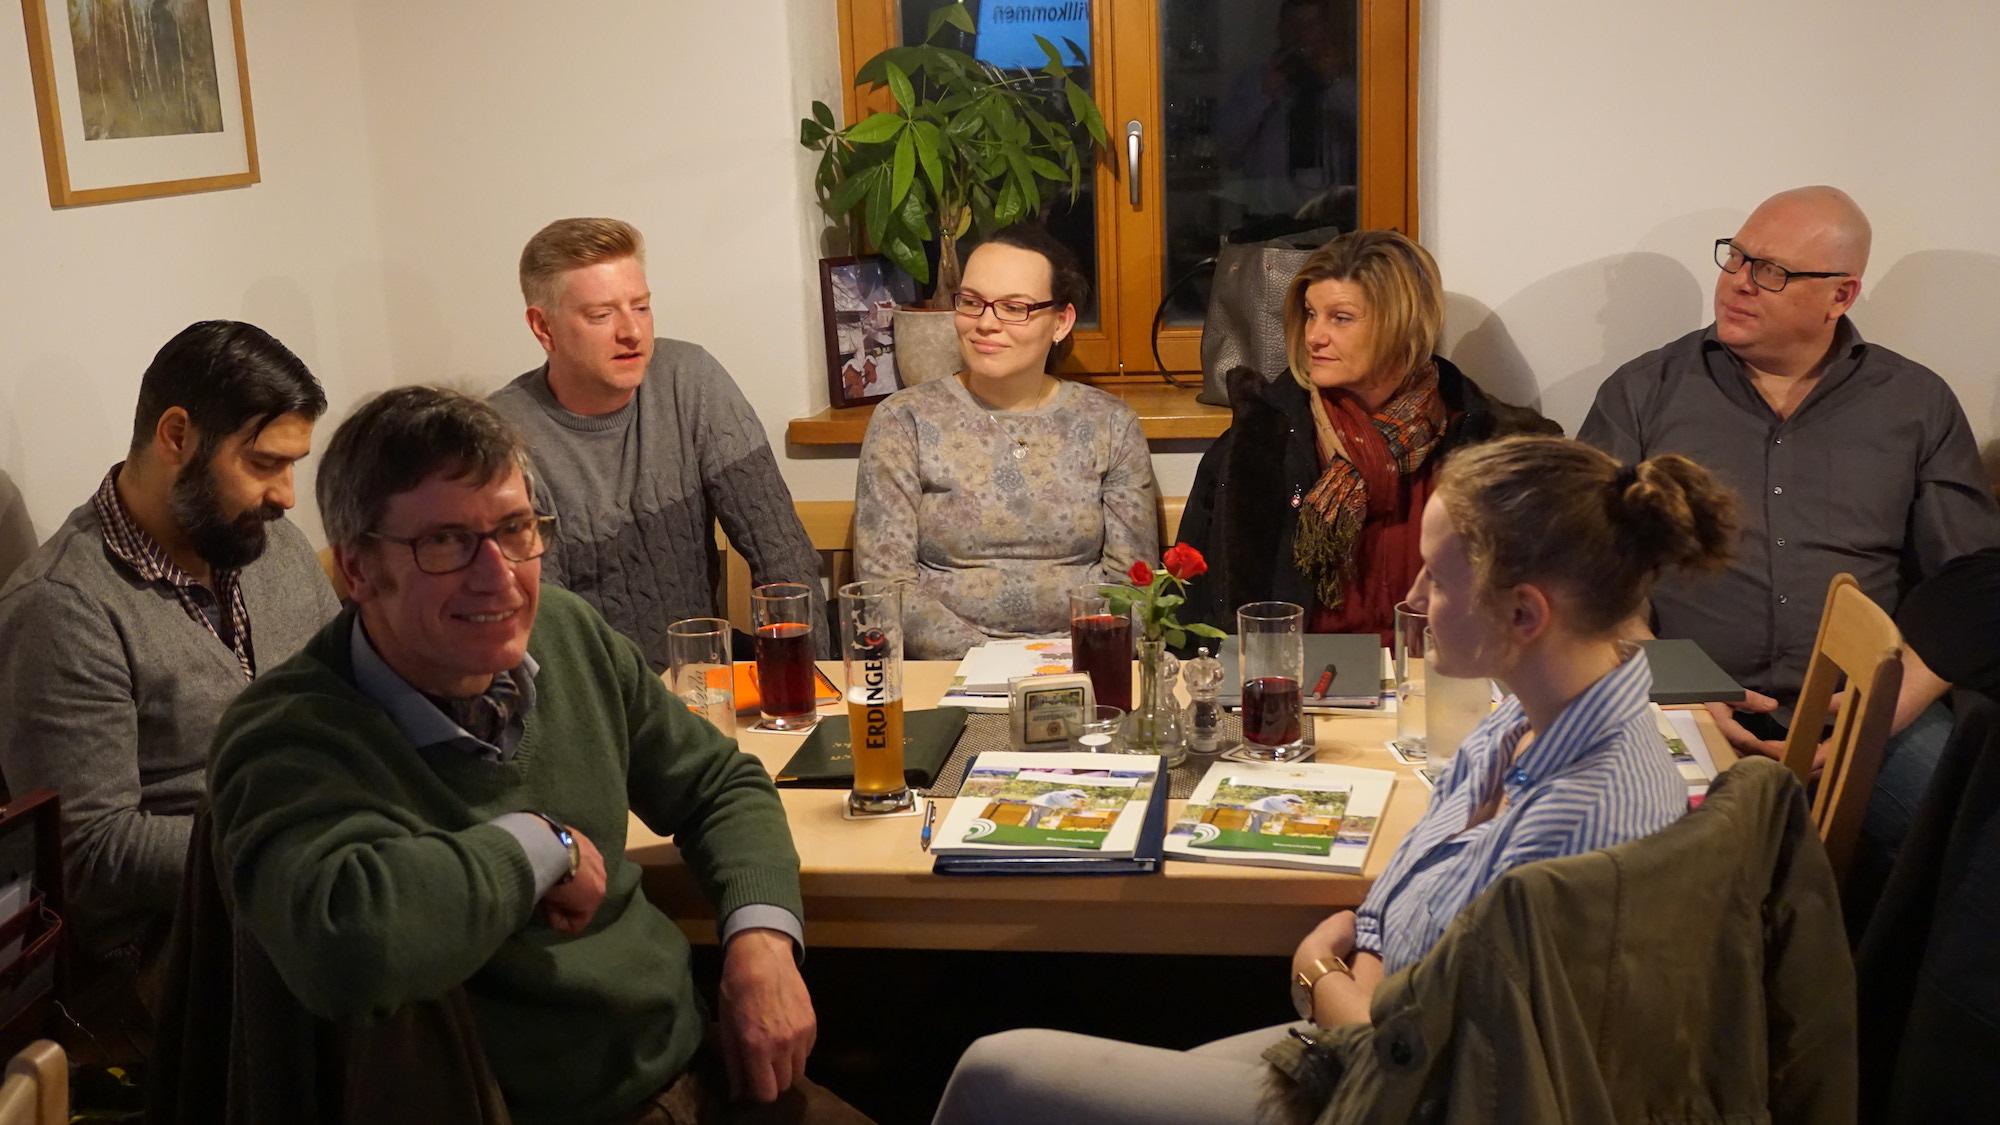 20180323_Jungimker Niederbayern_1